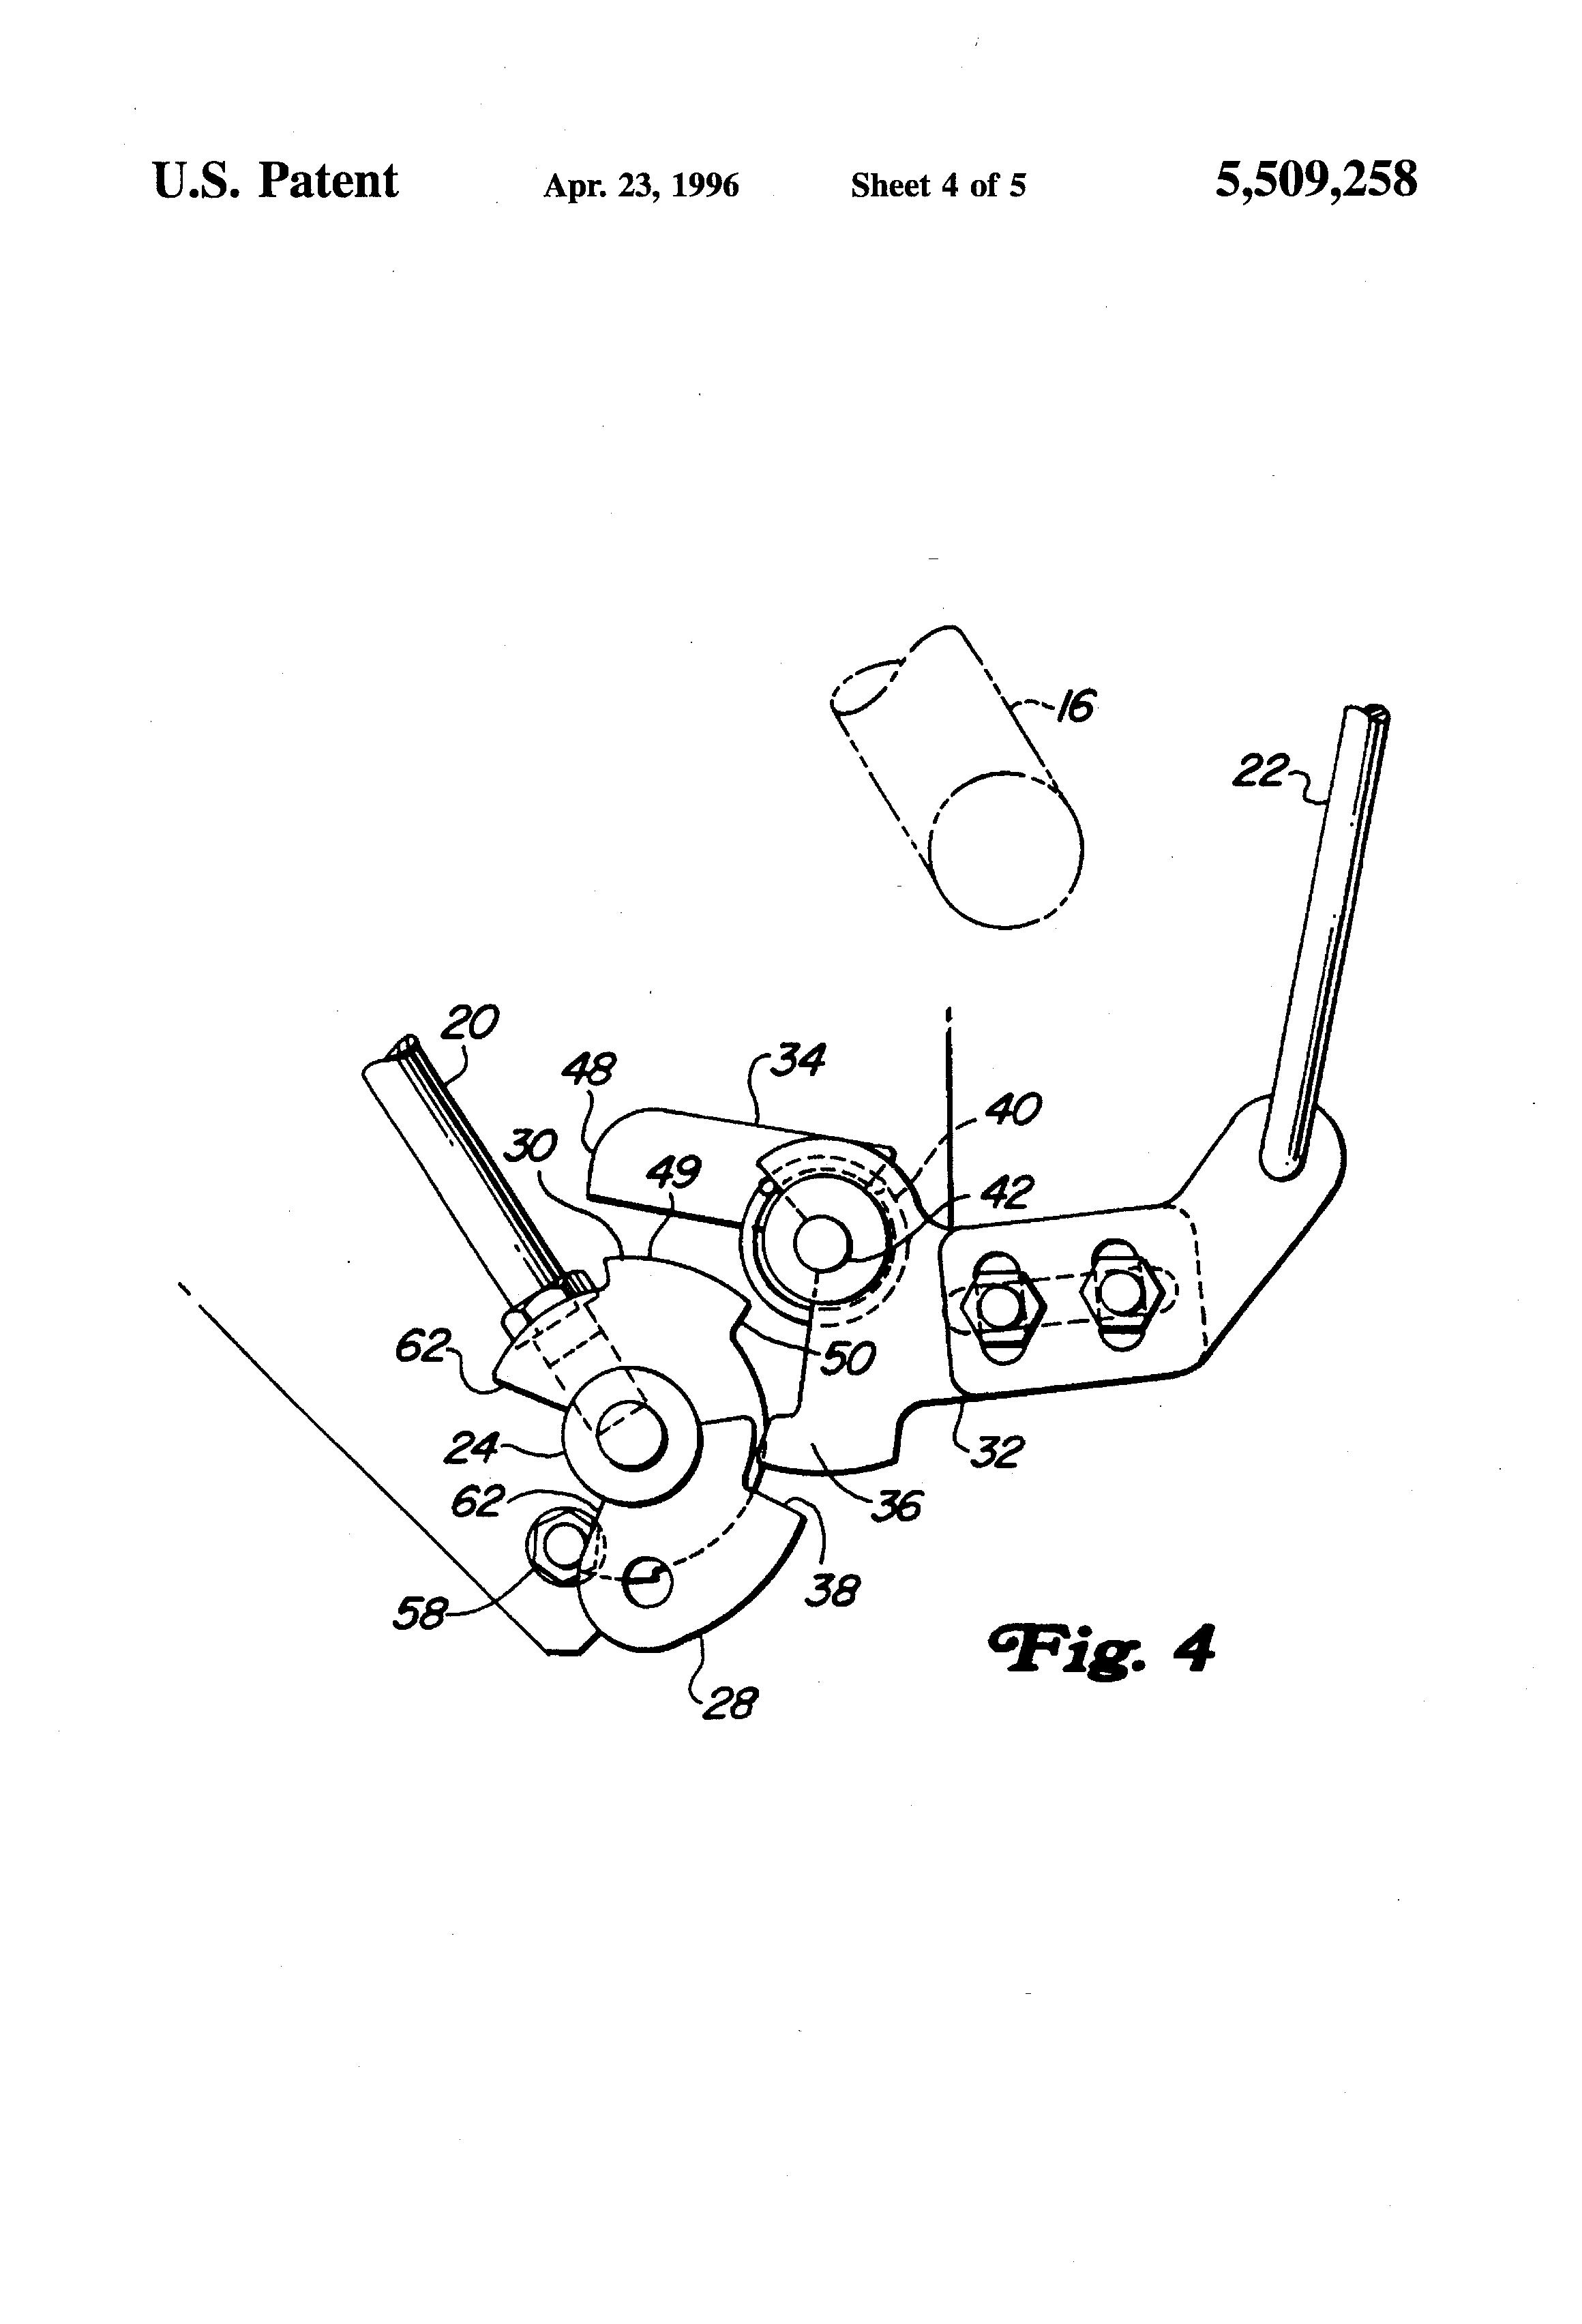 John Deere 14sb Engine Diagram Modern Design Of Wiring 112 As Well 790 Parts Imageresizertool Com Manualdownload